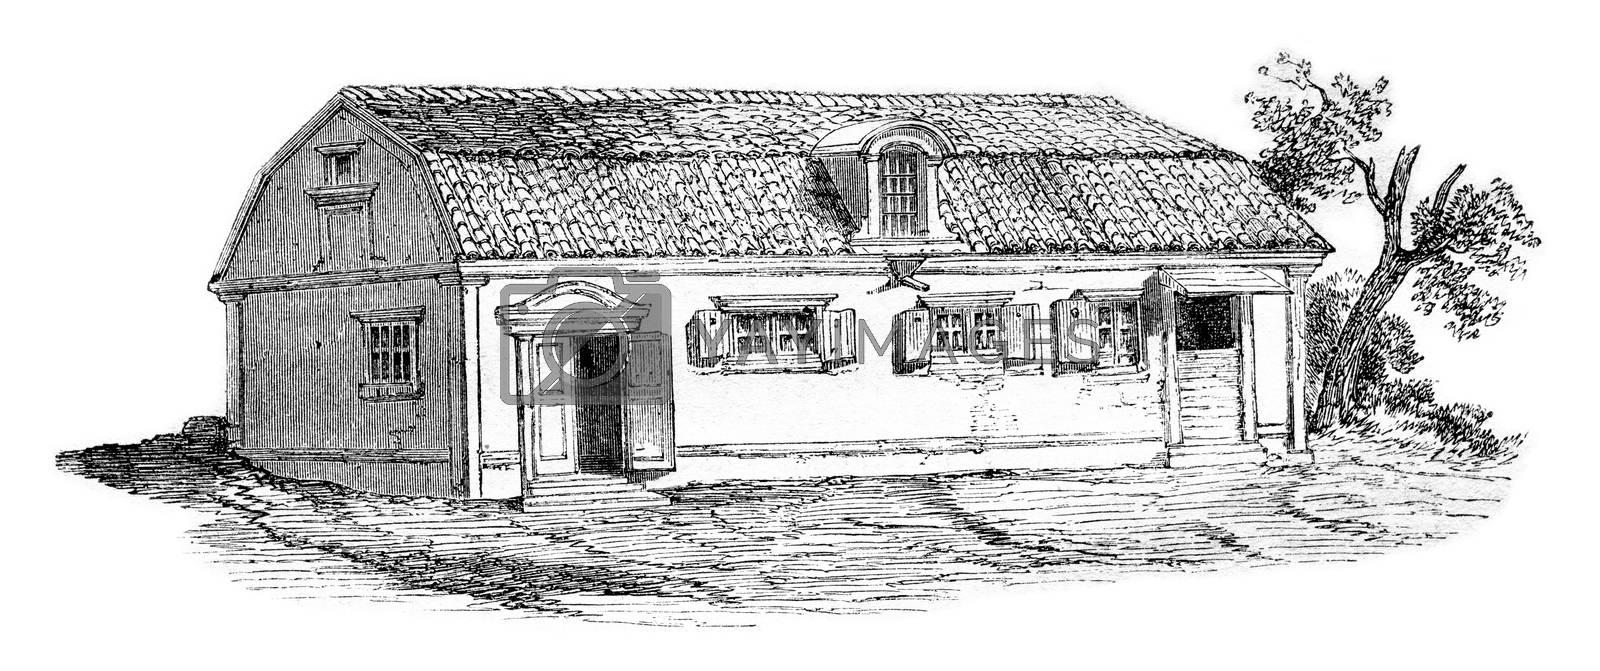 The home or Swedenborg lived in the suburb of Stockholm, vintage engraved illustration. Magasin Pittoresque 1857.